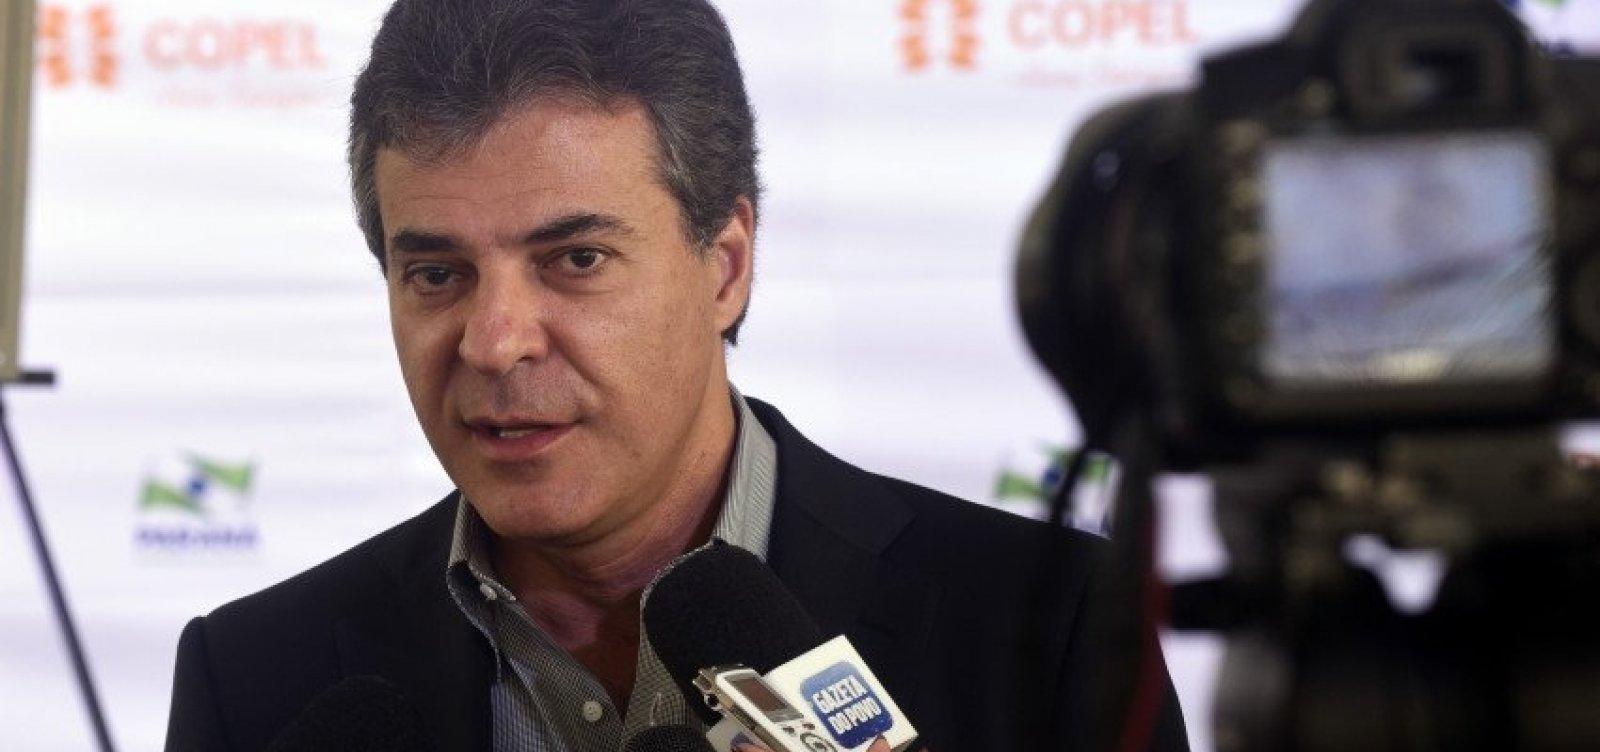 Delator compara esquema de Beto Richa ao de Sérgio Cabral